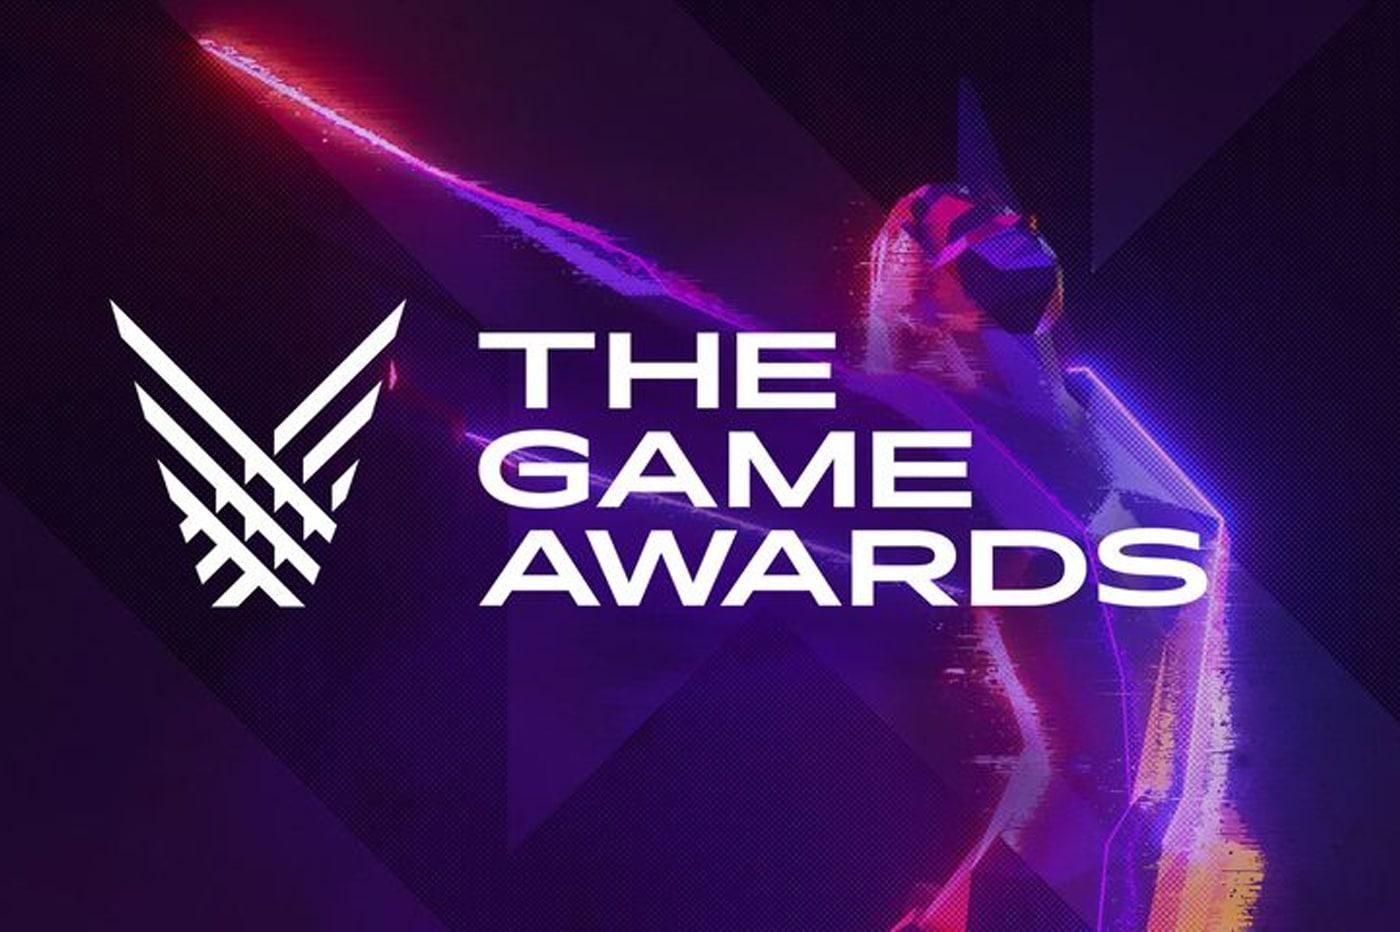 Les Game Awards 2019 - Les Game Awards 2020